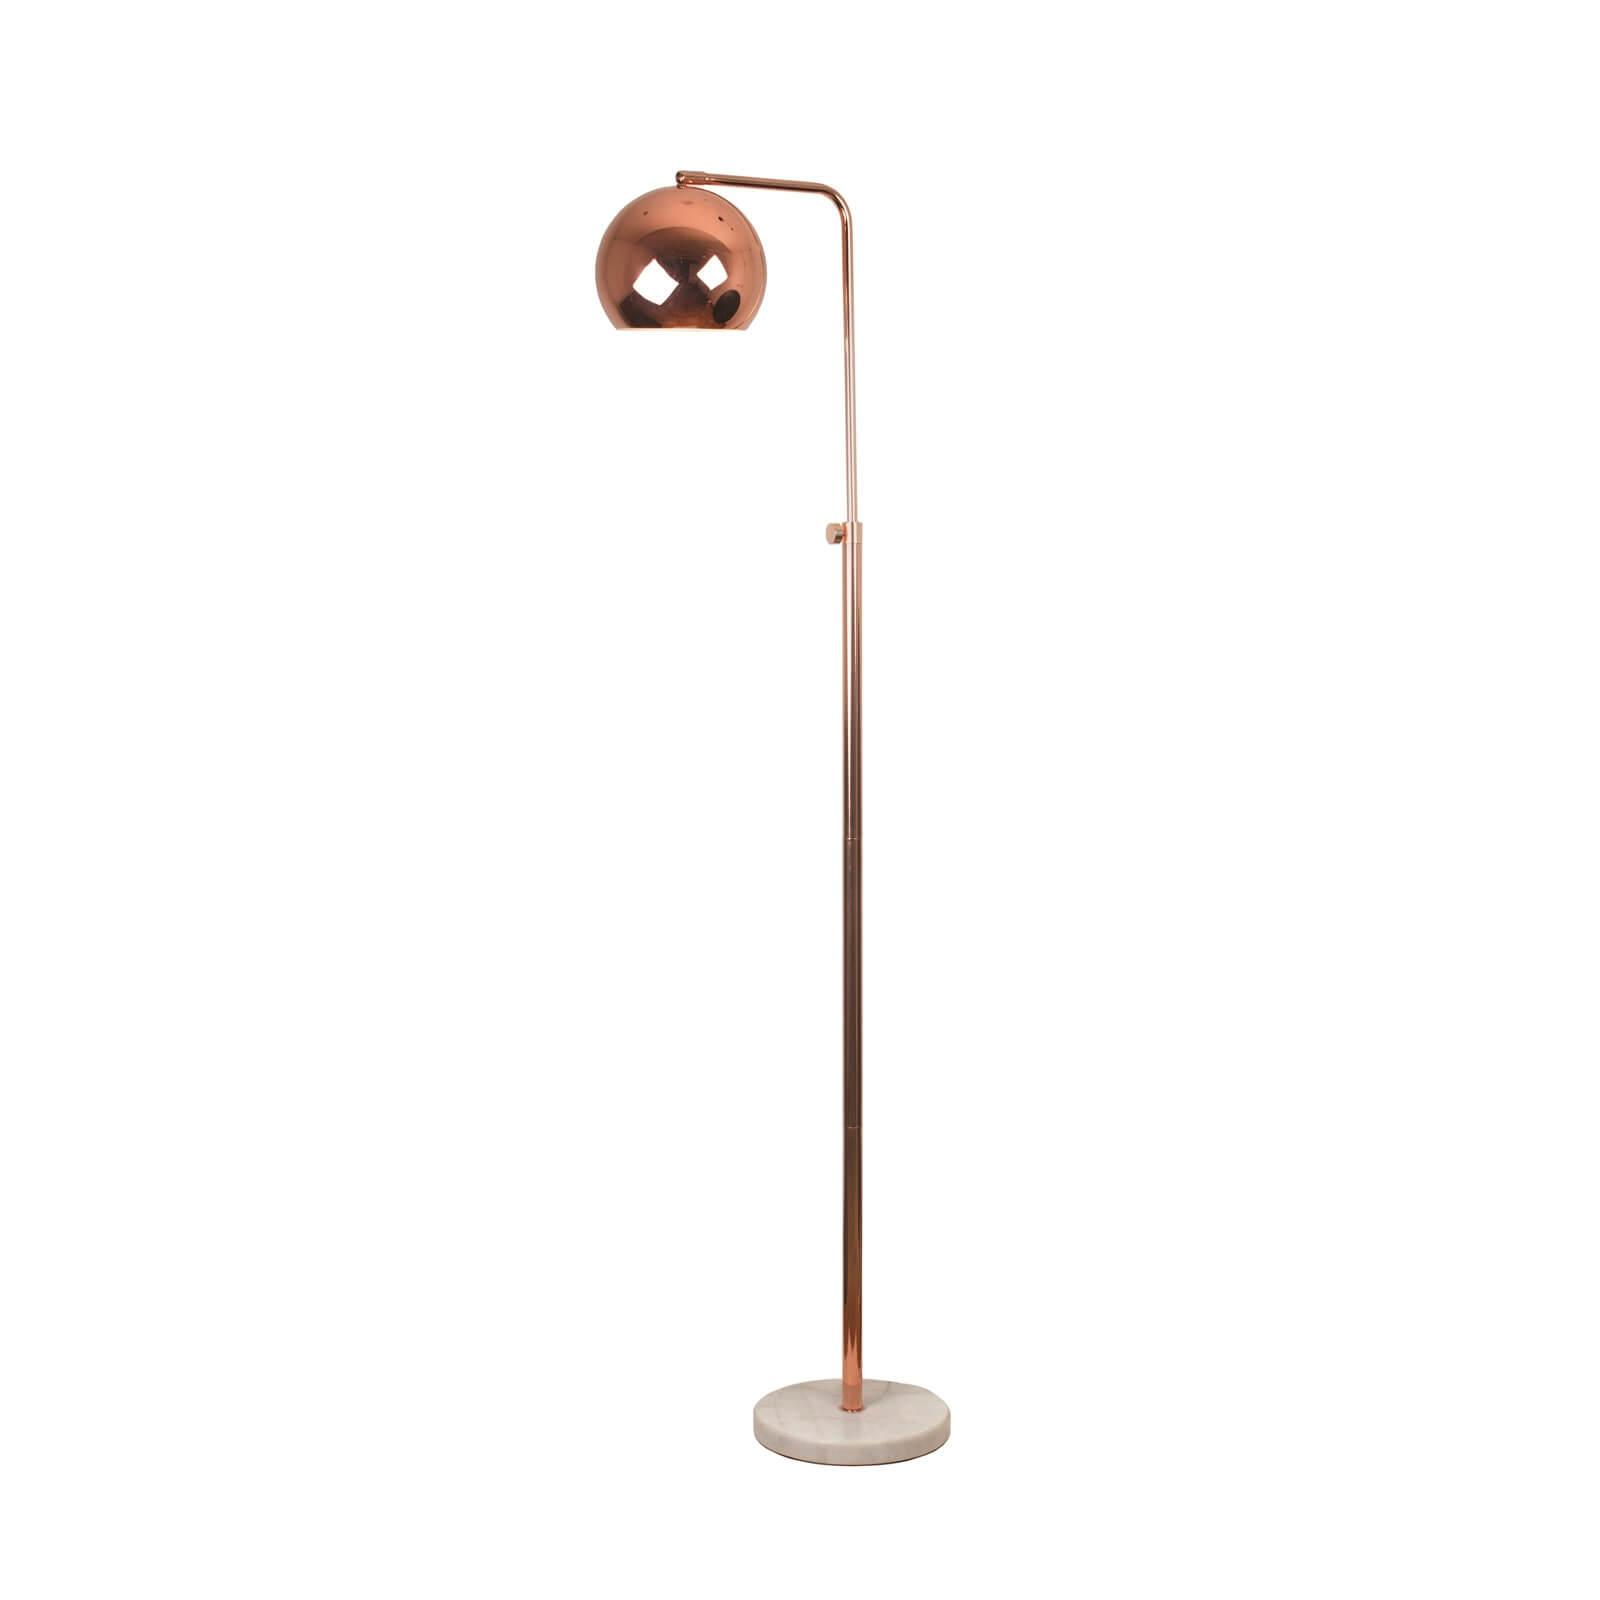 Evan Marble and Copper Effect Floor Lamp